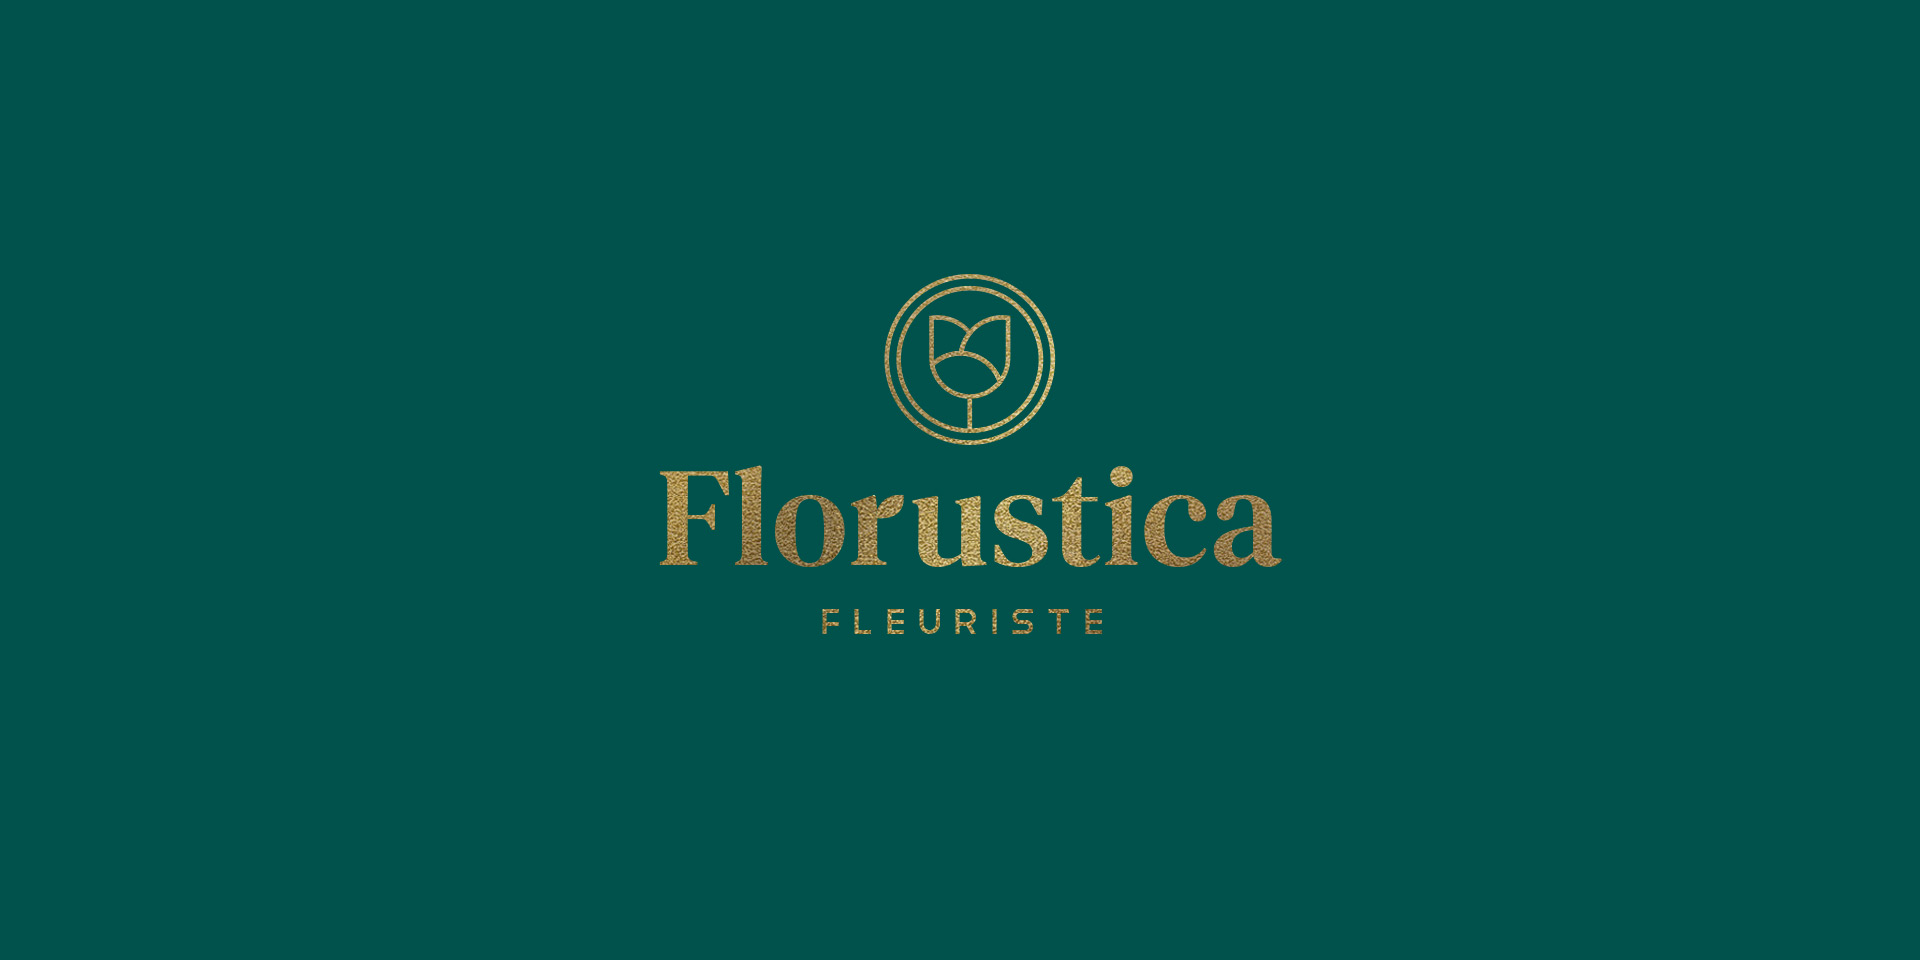 identite visuelle fleuriste florustica-logo-graphiste-webdesigner-freelance-strasbourg-studio-polette-01